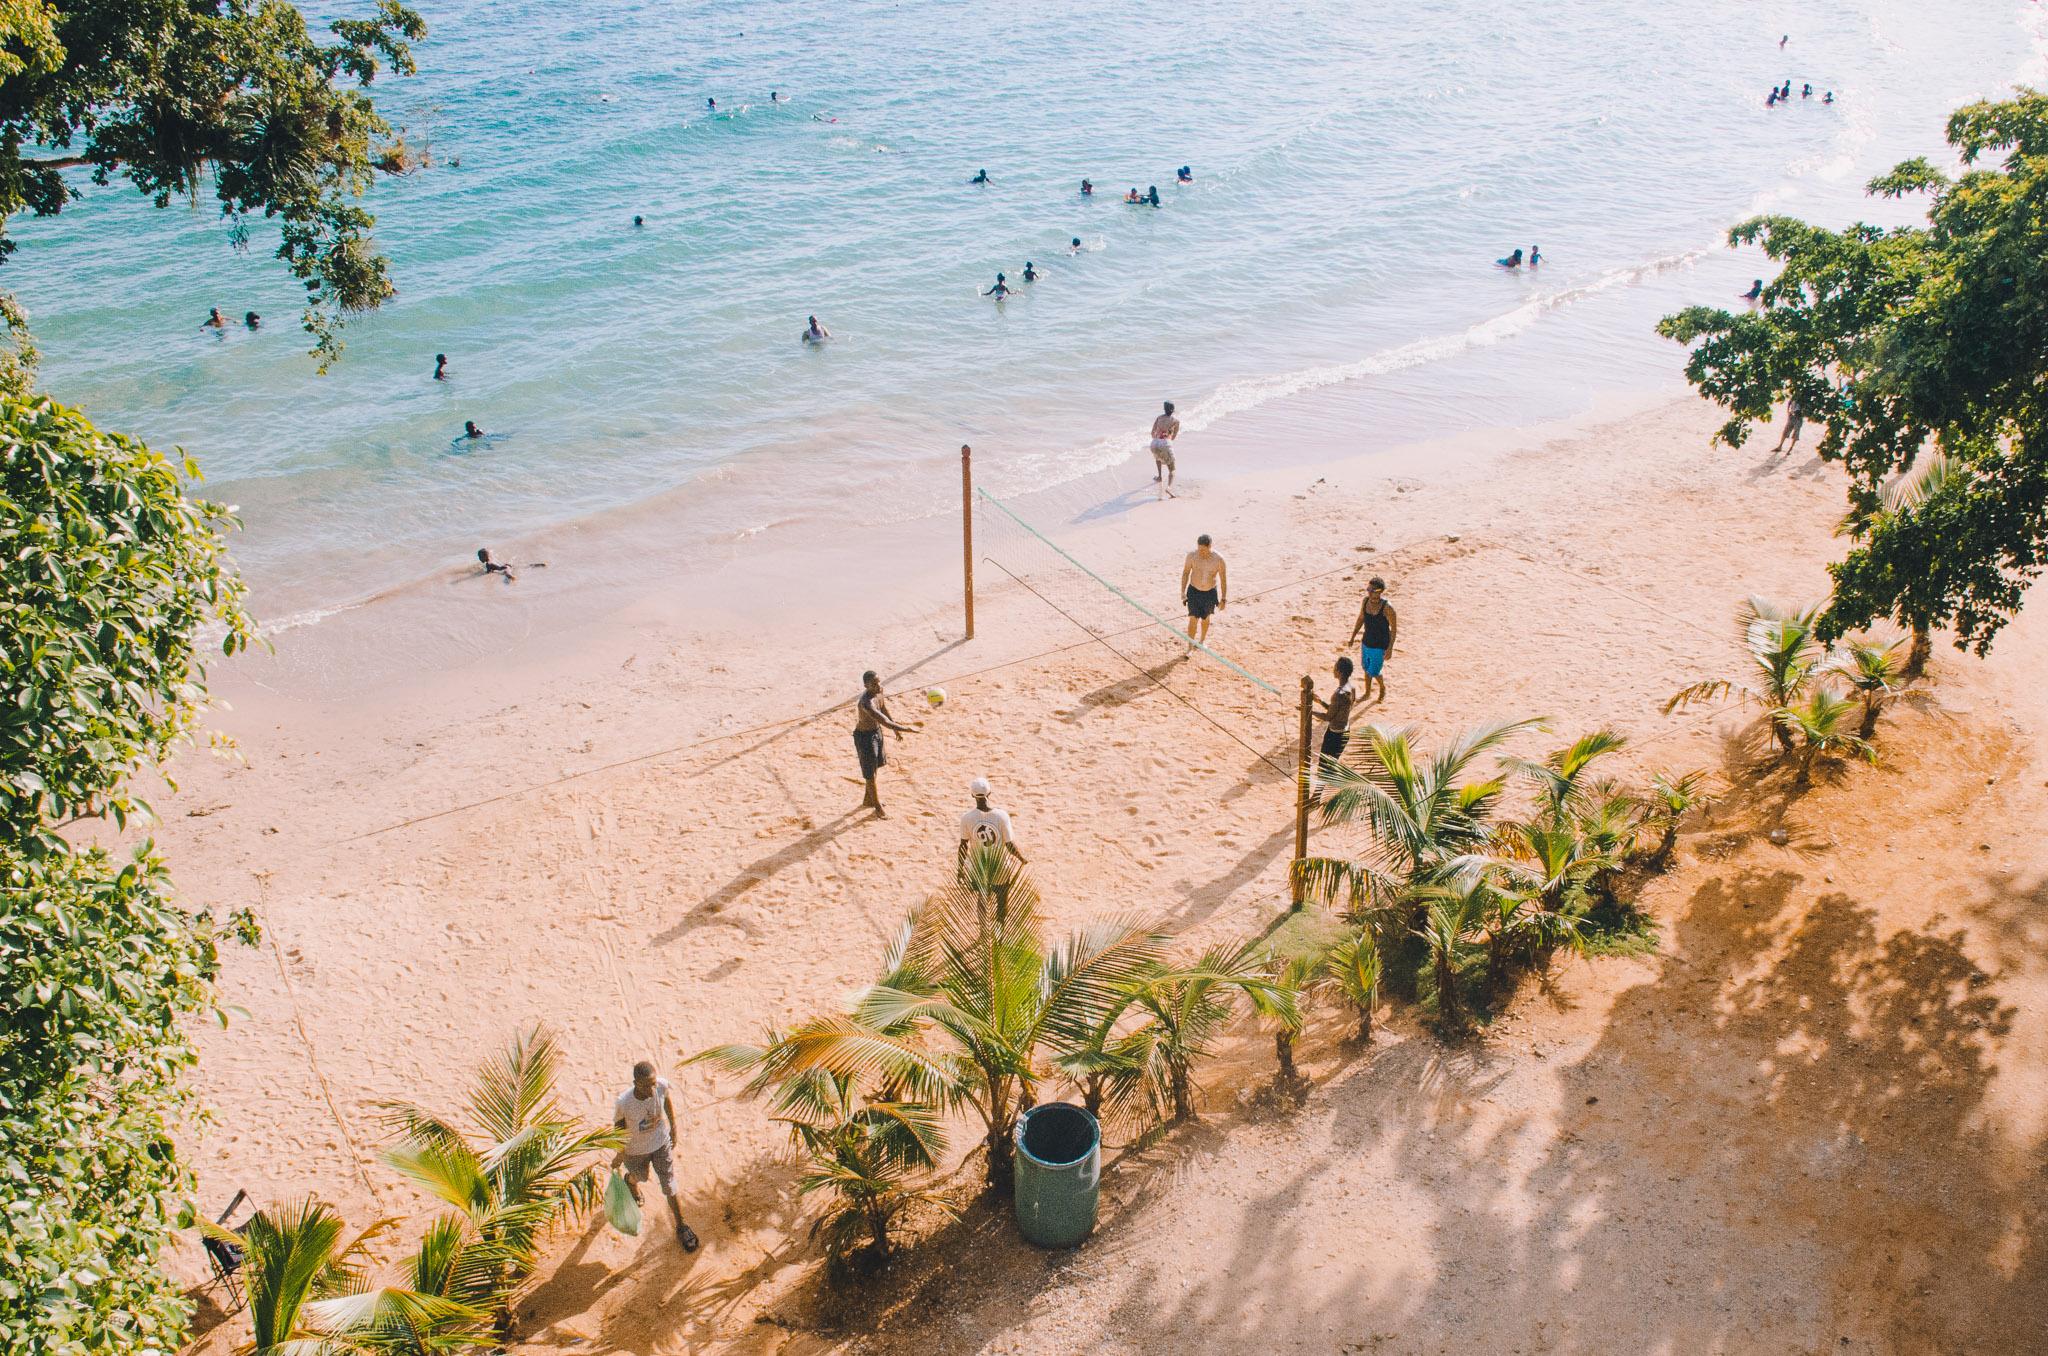 dominican-republic-18.jpg